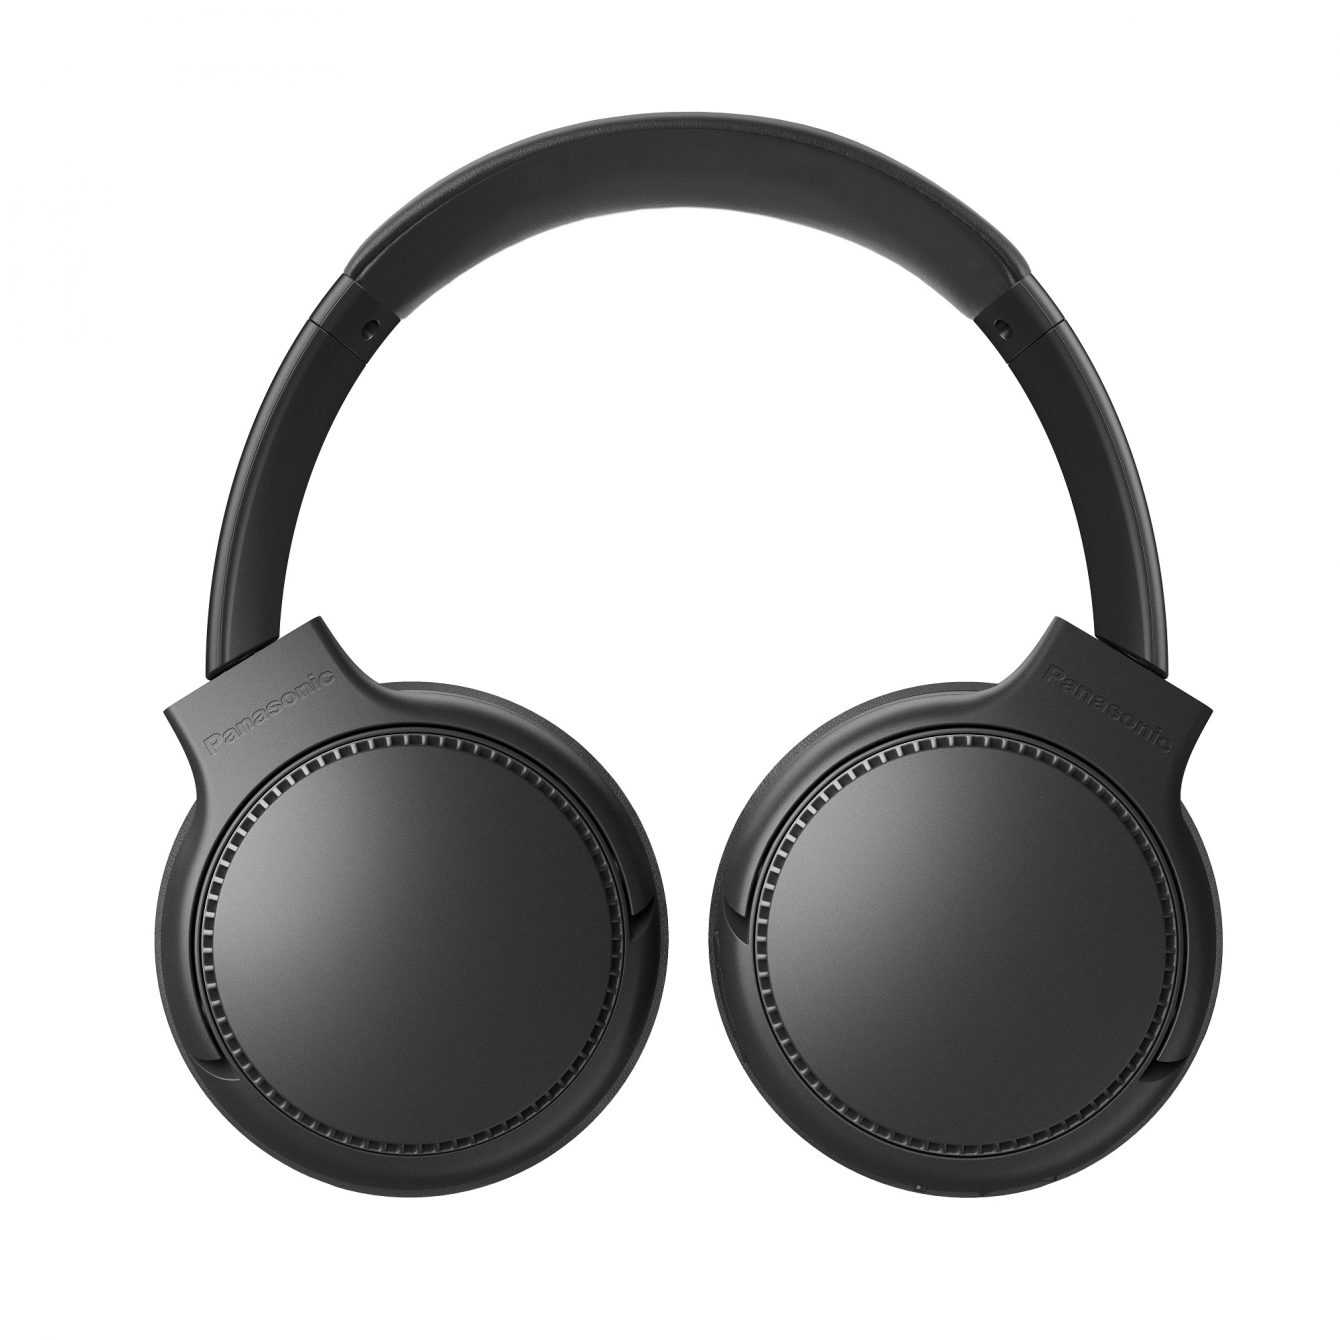 Cuffie wireless Panasonic: nuovi modelli per tutti i gusti